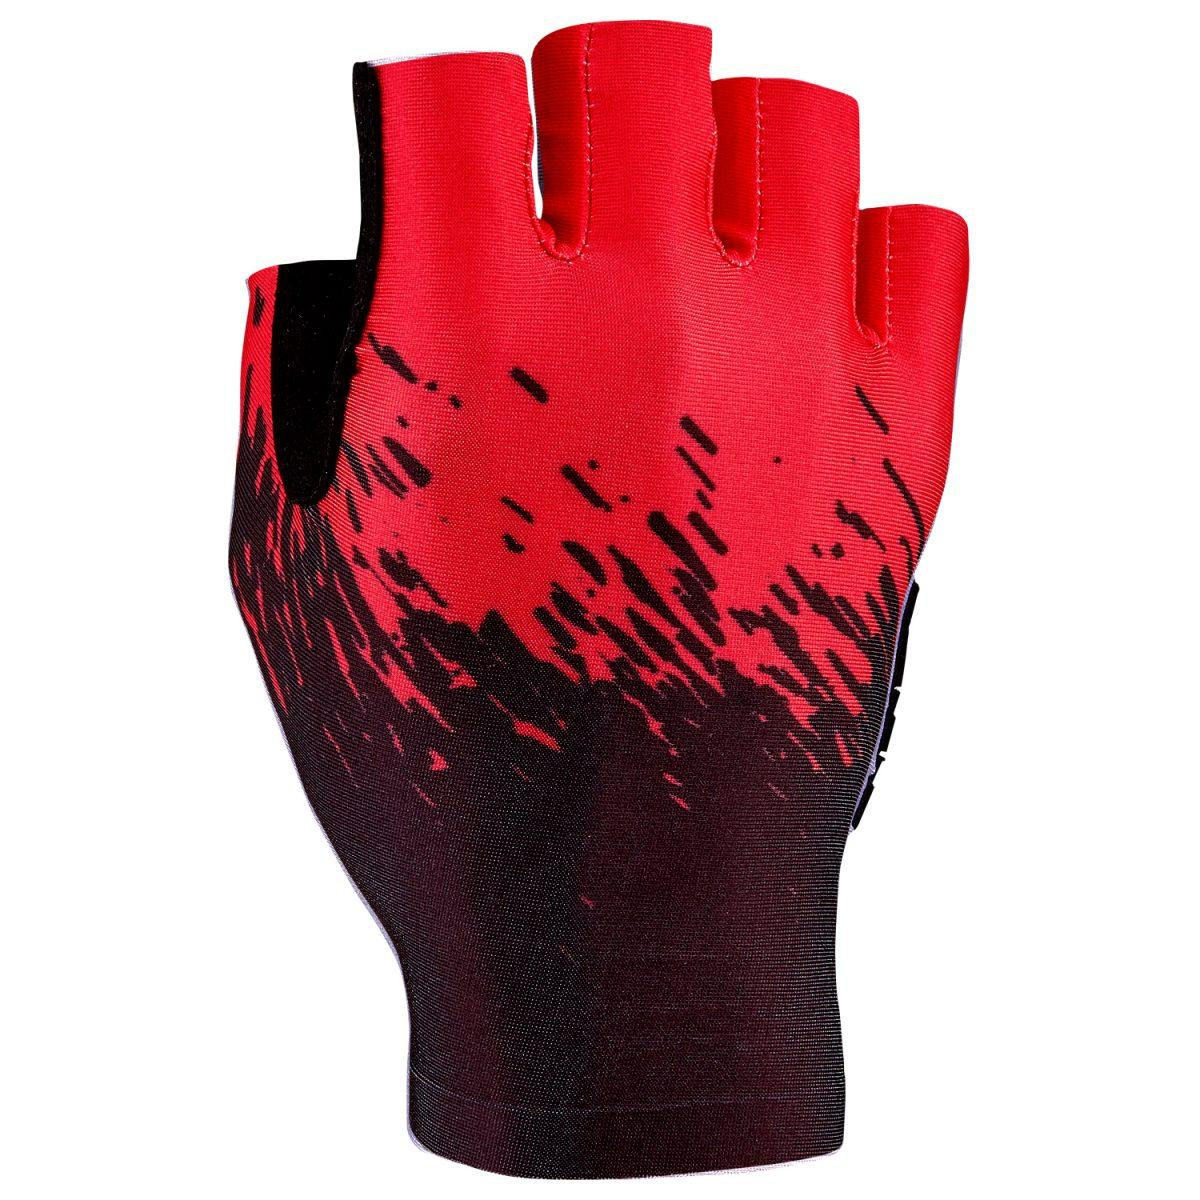 SUPACAZ GLOVE HF SUPAG BLACK / RED